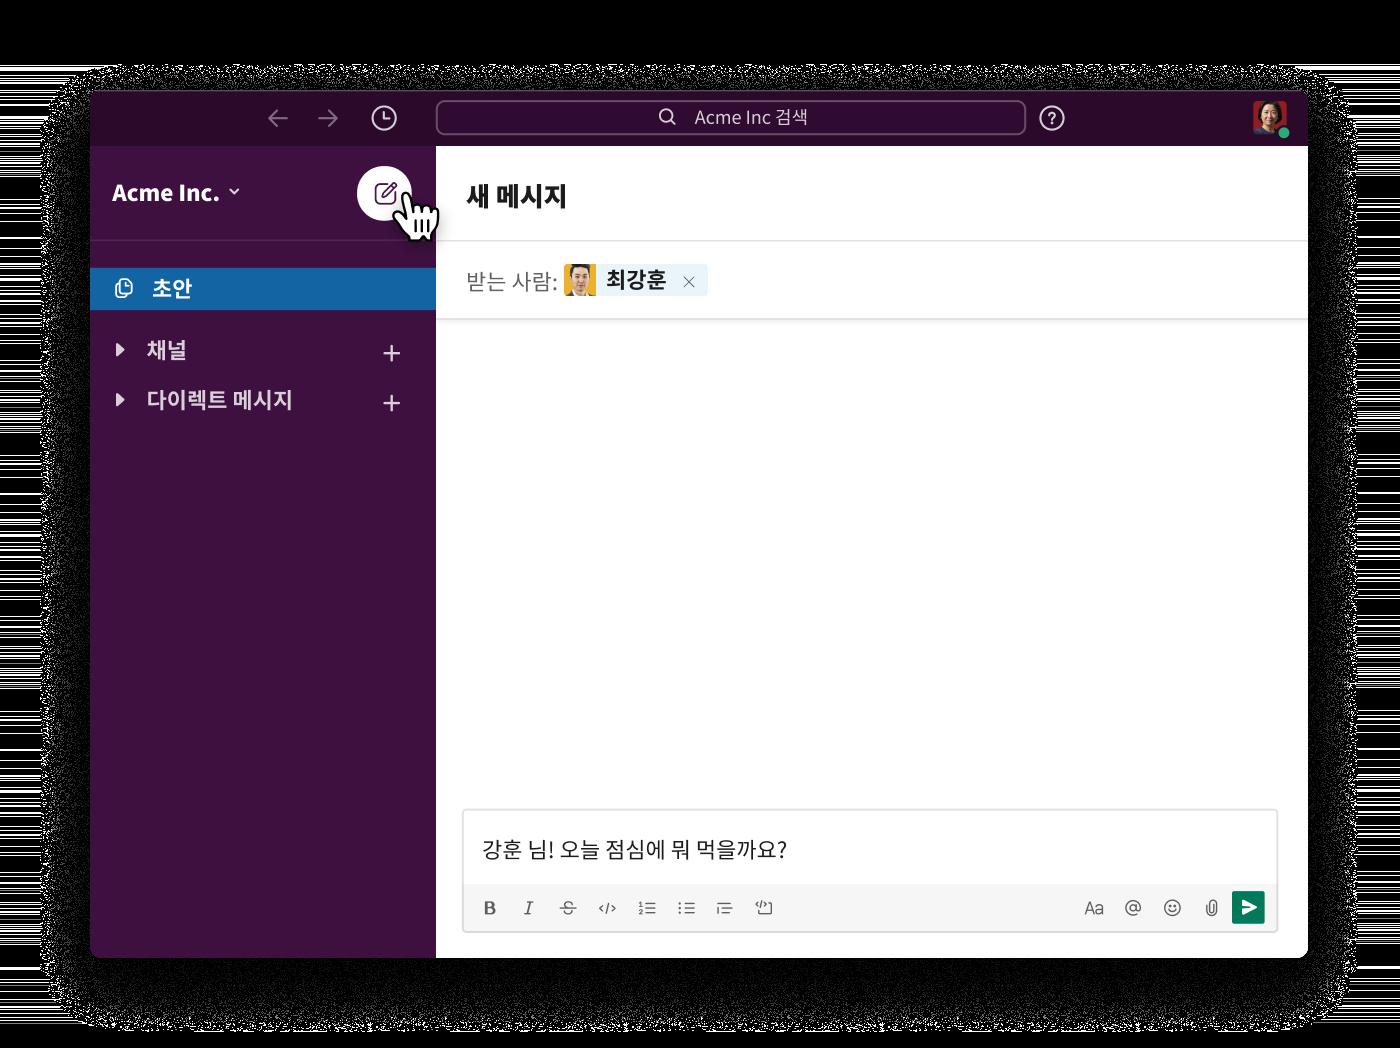 Slack에서 작성 버튼을 눌러 새 메시지를 작성하세요